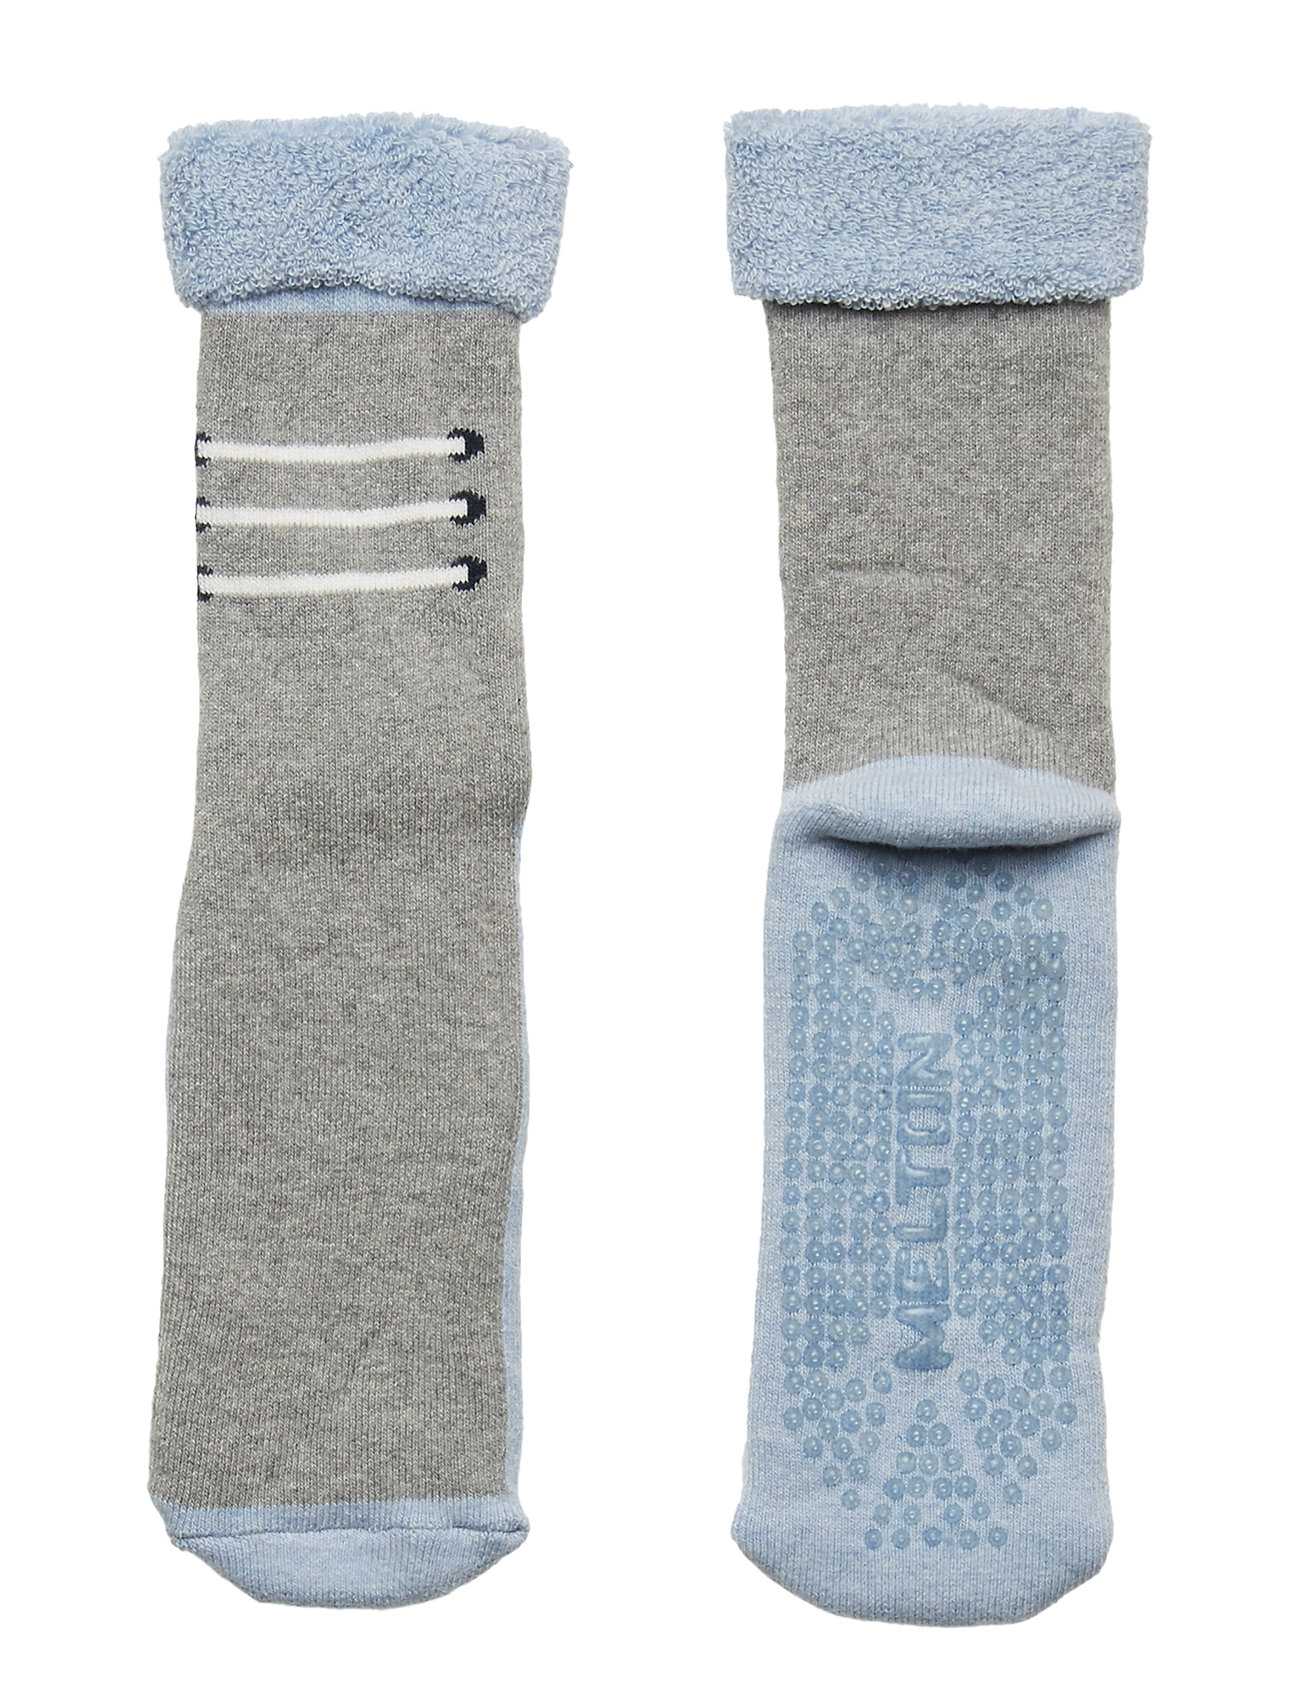 Melton Baby Terry Sock w/ABS - LIGHT GREY MELANGE